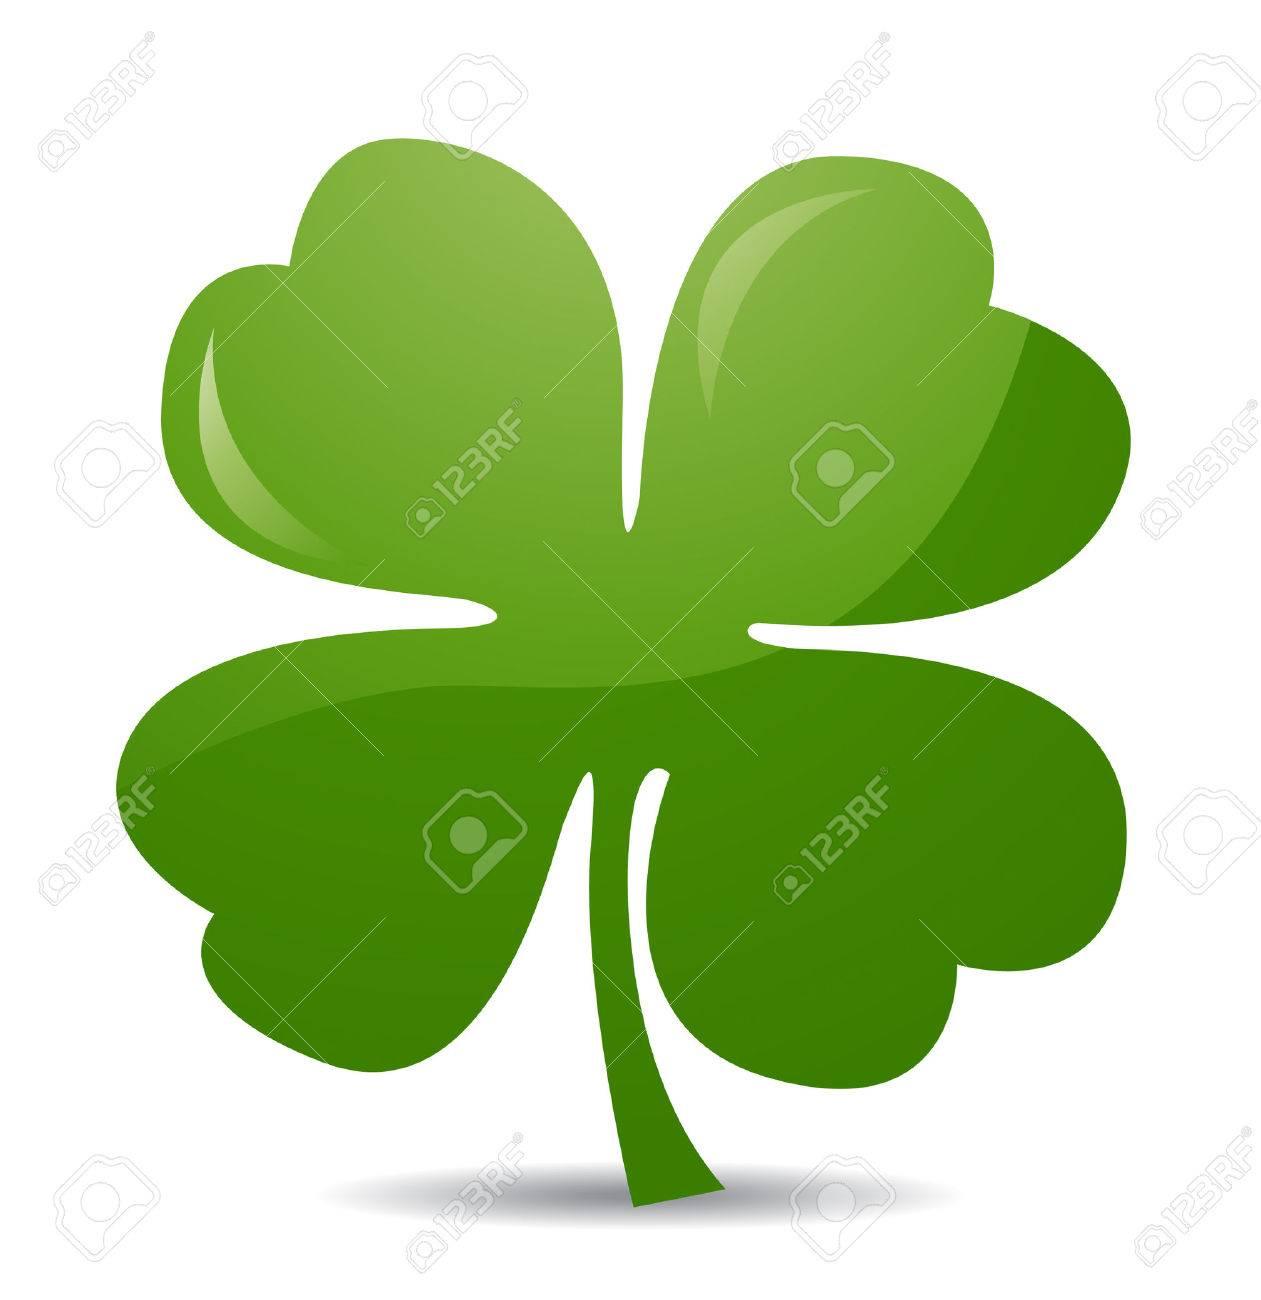 Four leaf clover - 30069281